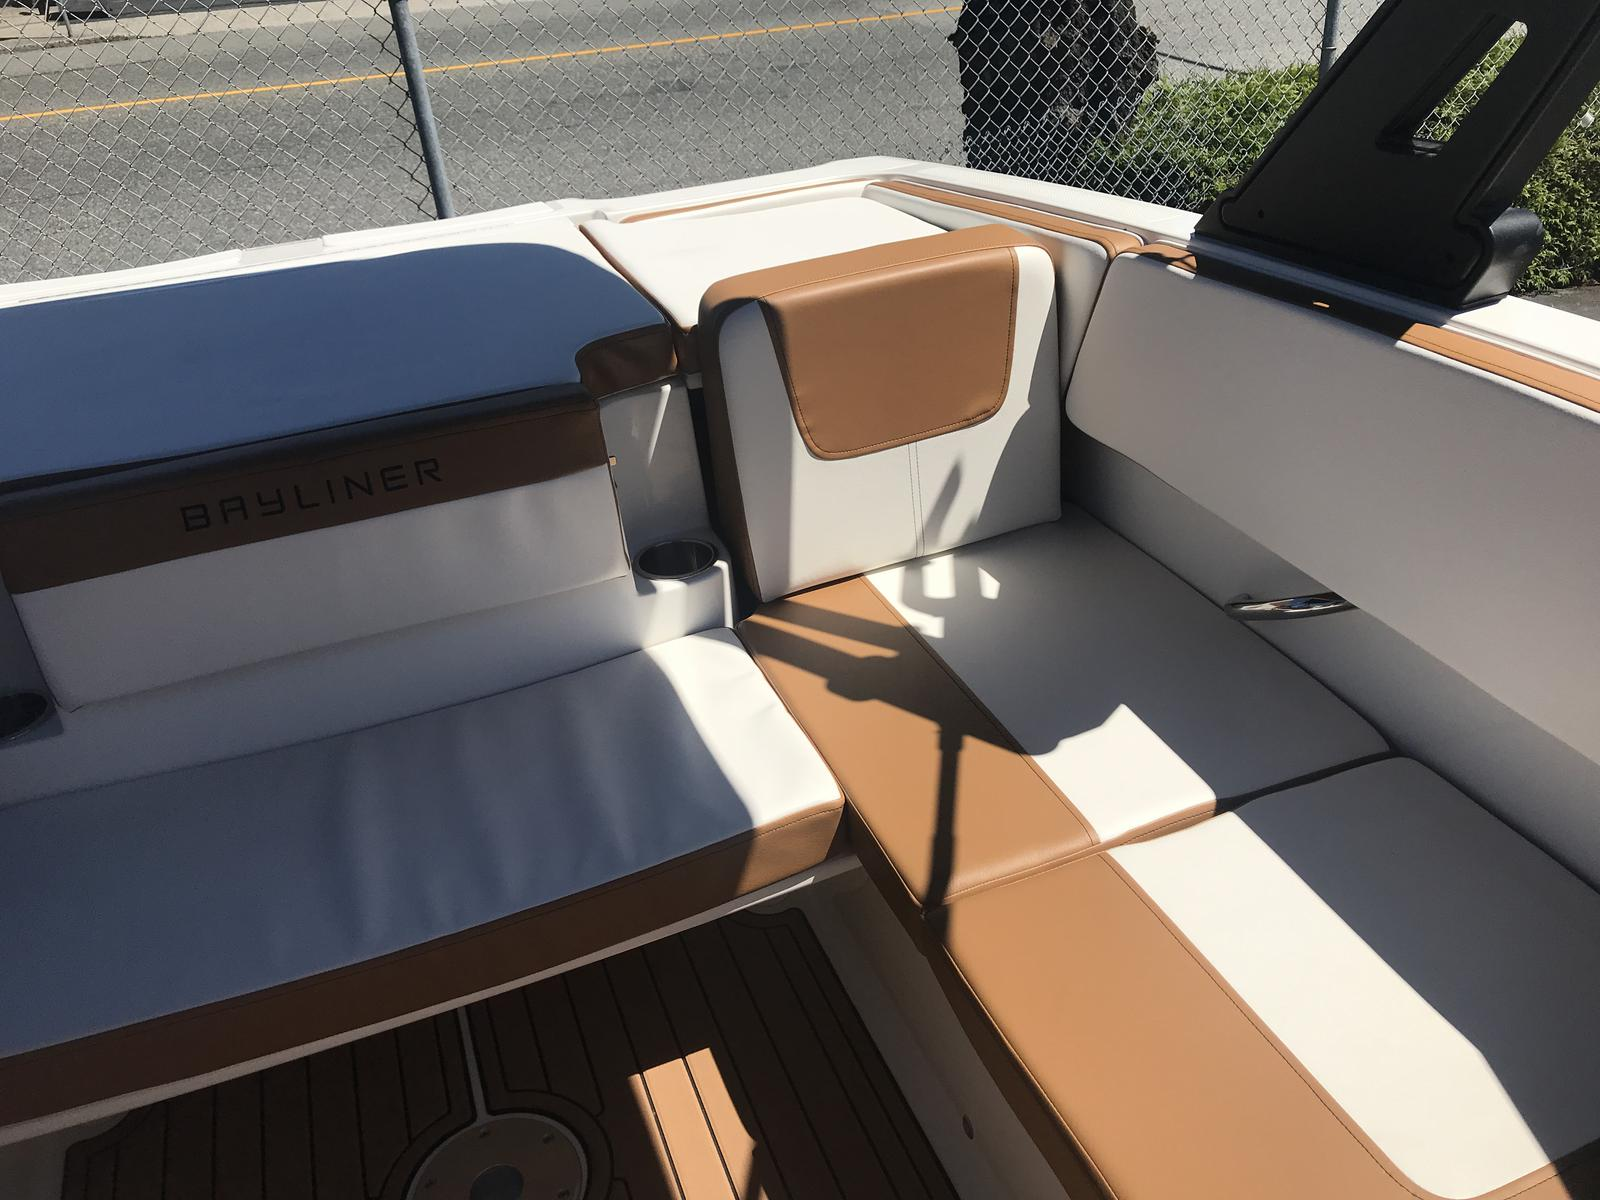 2019 Bayliner boat for sale, model of the boat is VR4 Bowrider & Image # 3 of 23